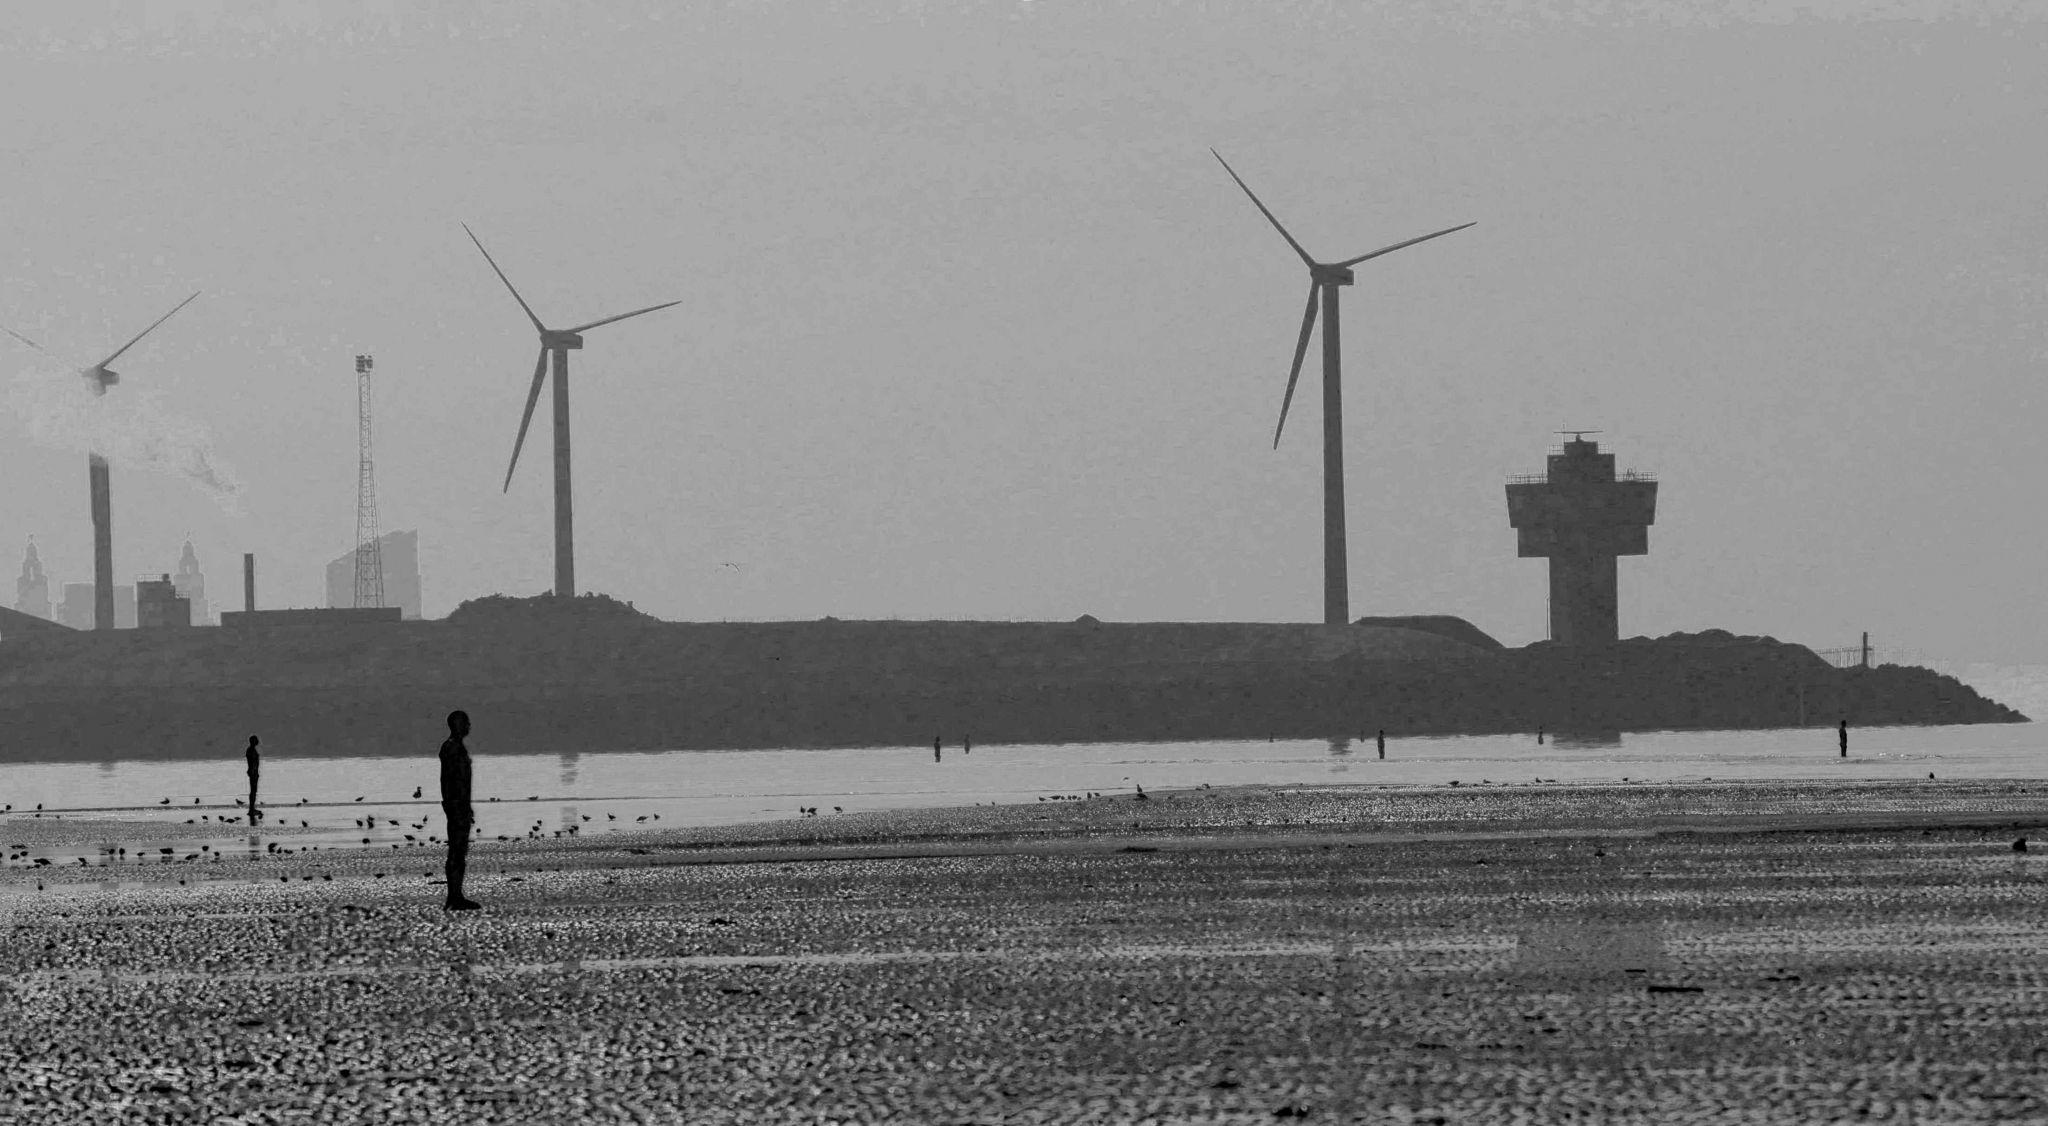 Iron men and Seaforth docks, United Kingdom